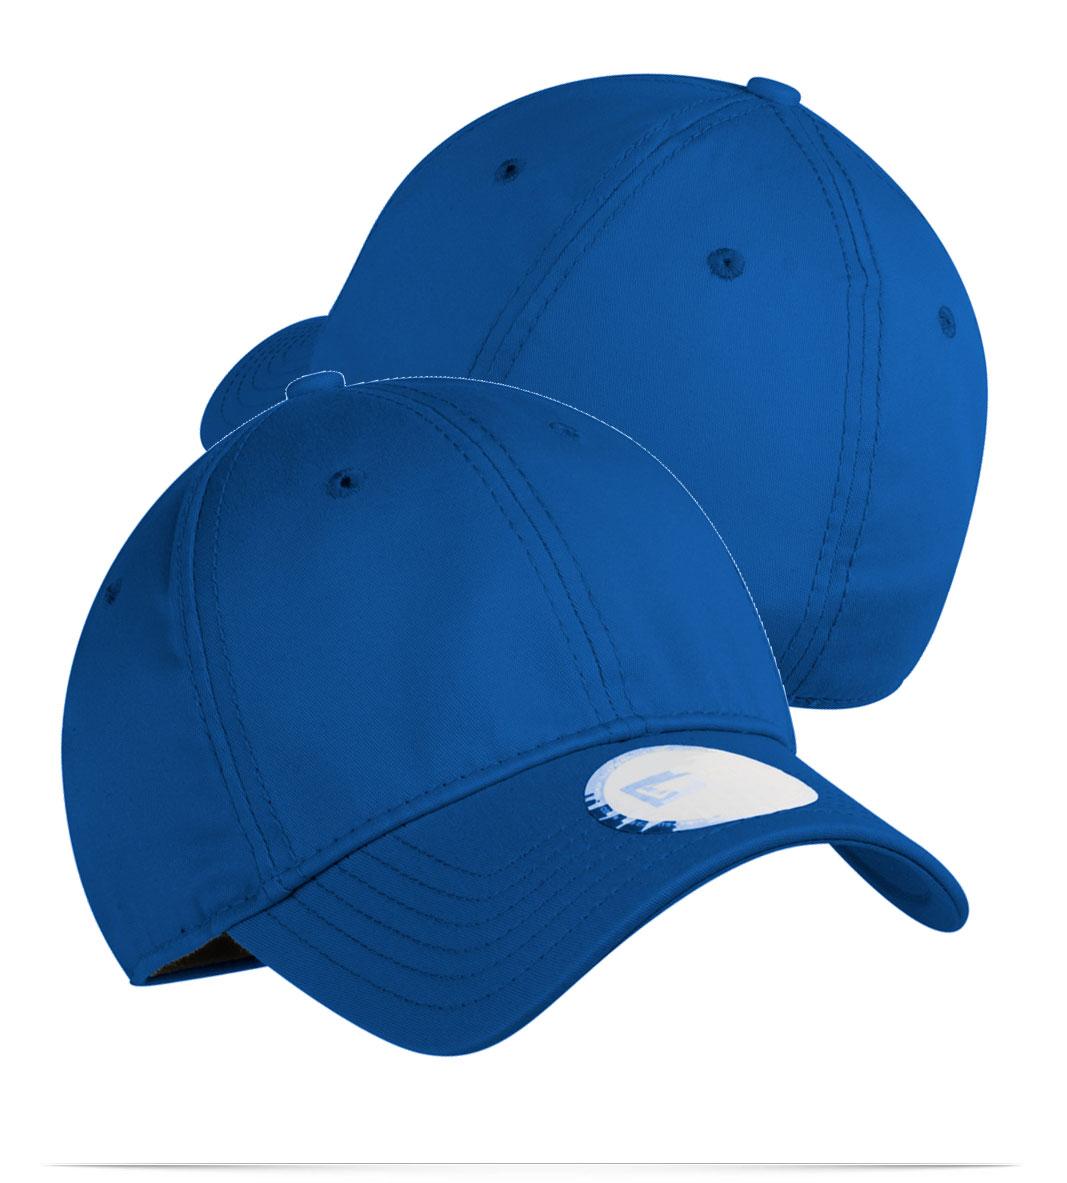 Personalized New Era Unstructured Stretch Cotton Cap